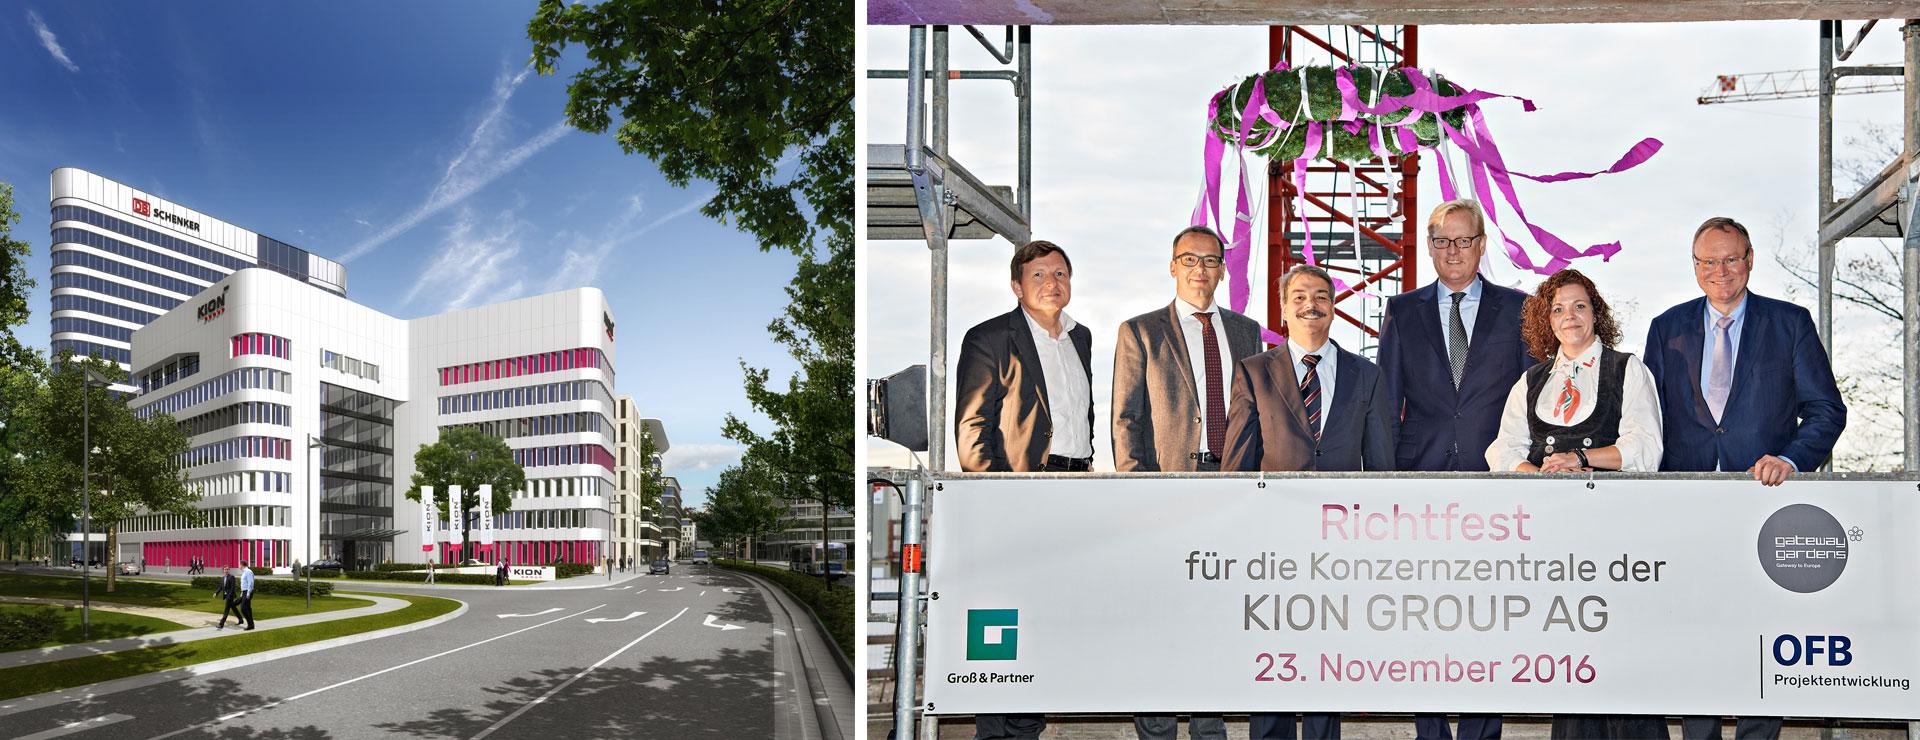 Bauunternehmen Frankfurt bild rechts v l uwe bordt bgf michael hauger leiter corporate